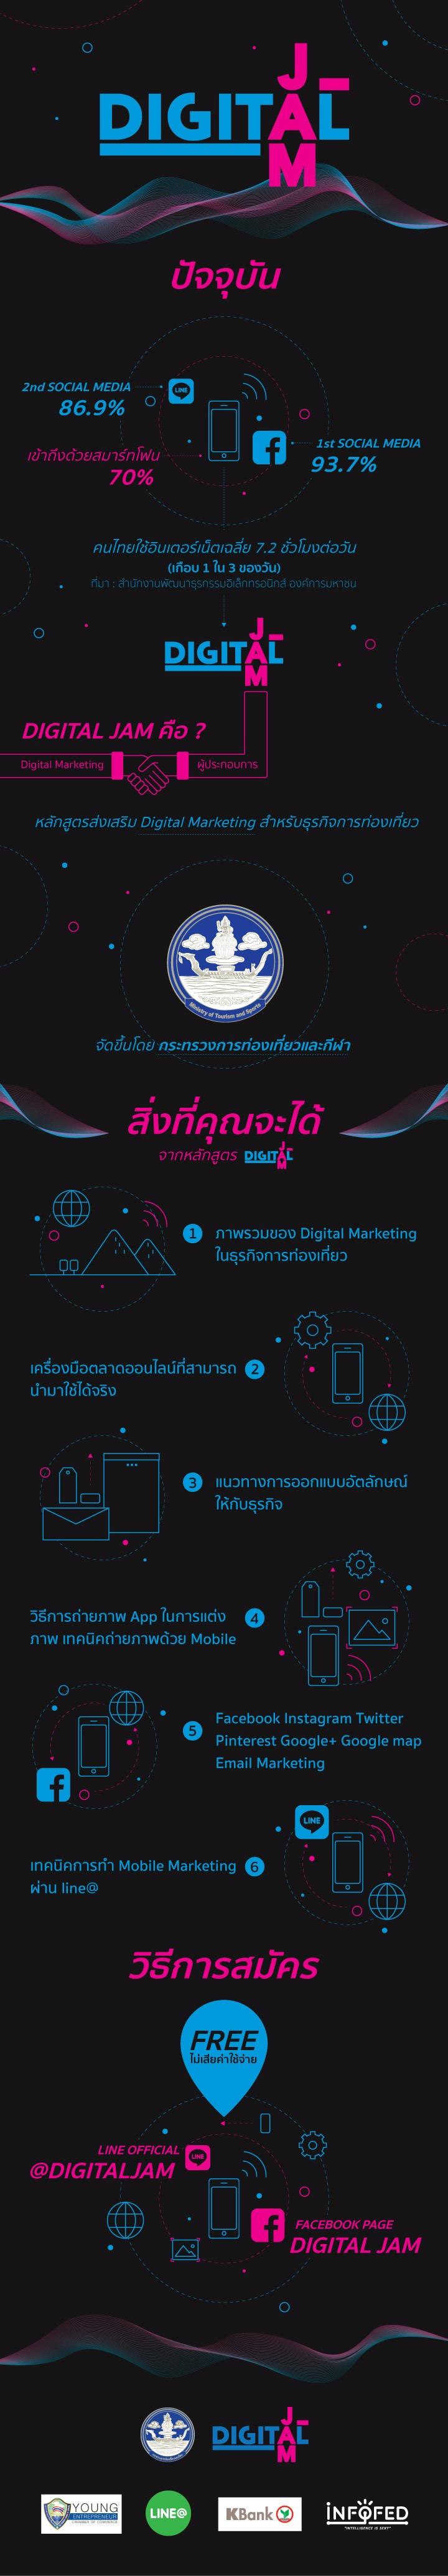 [infographic] #DigitalJam2016 คืออะไร